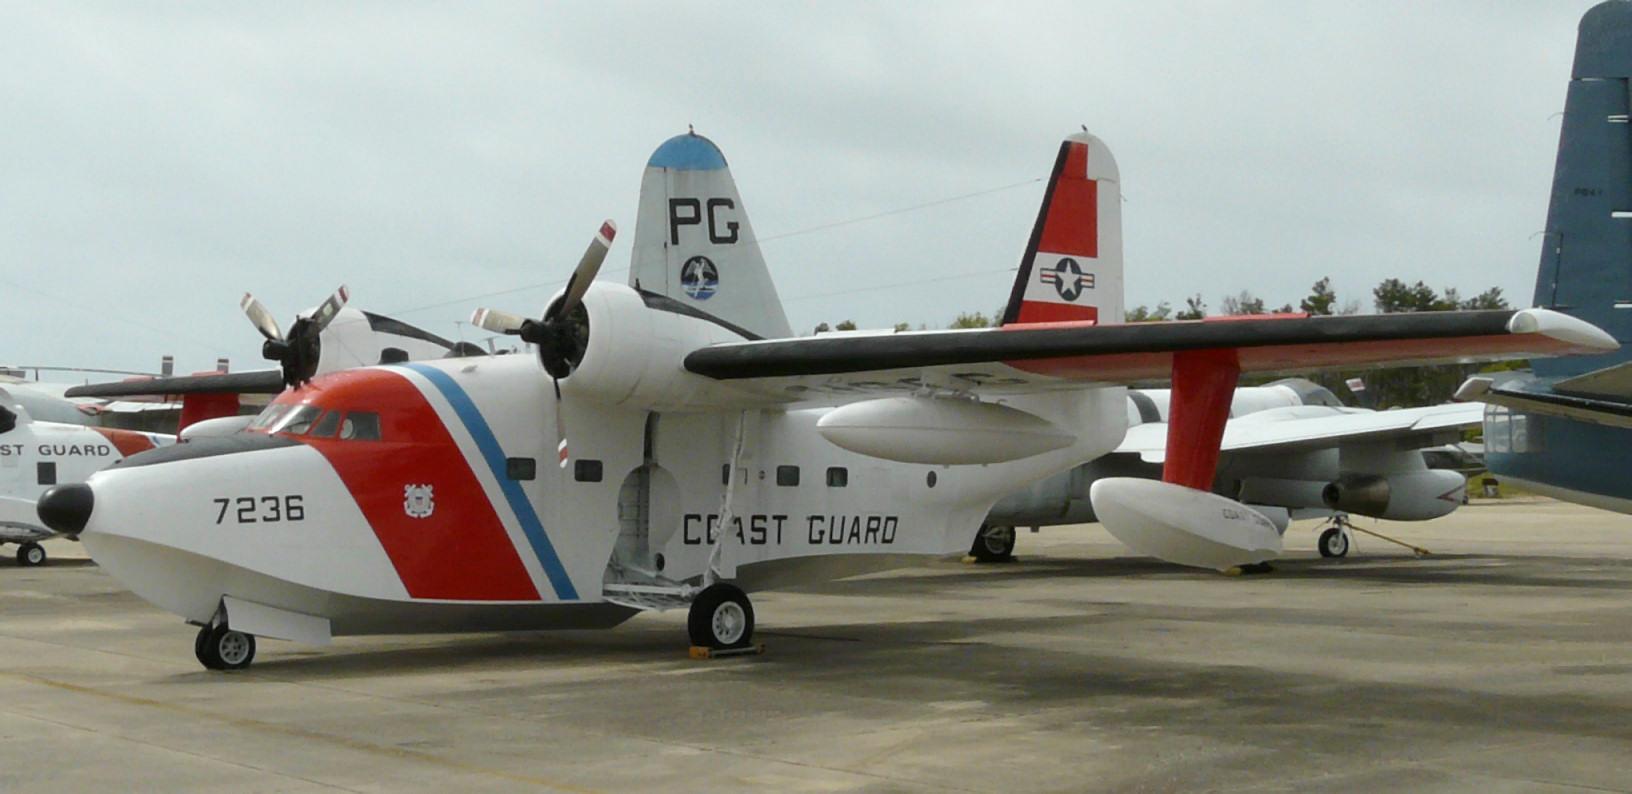 Grumman Hu-16 Albatross - Patricio Hebrero and Gonzalo Avila - Decent Spanish Book